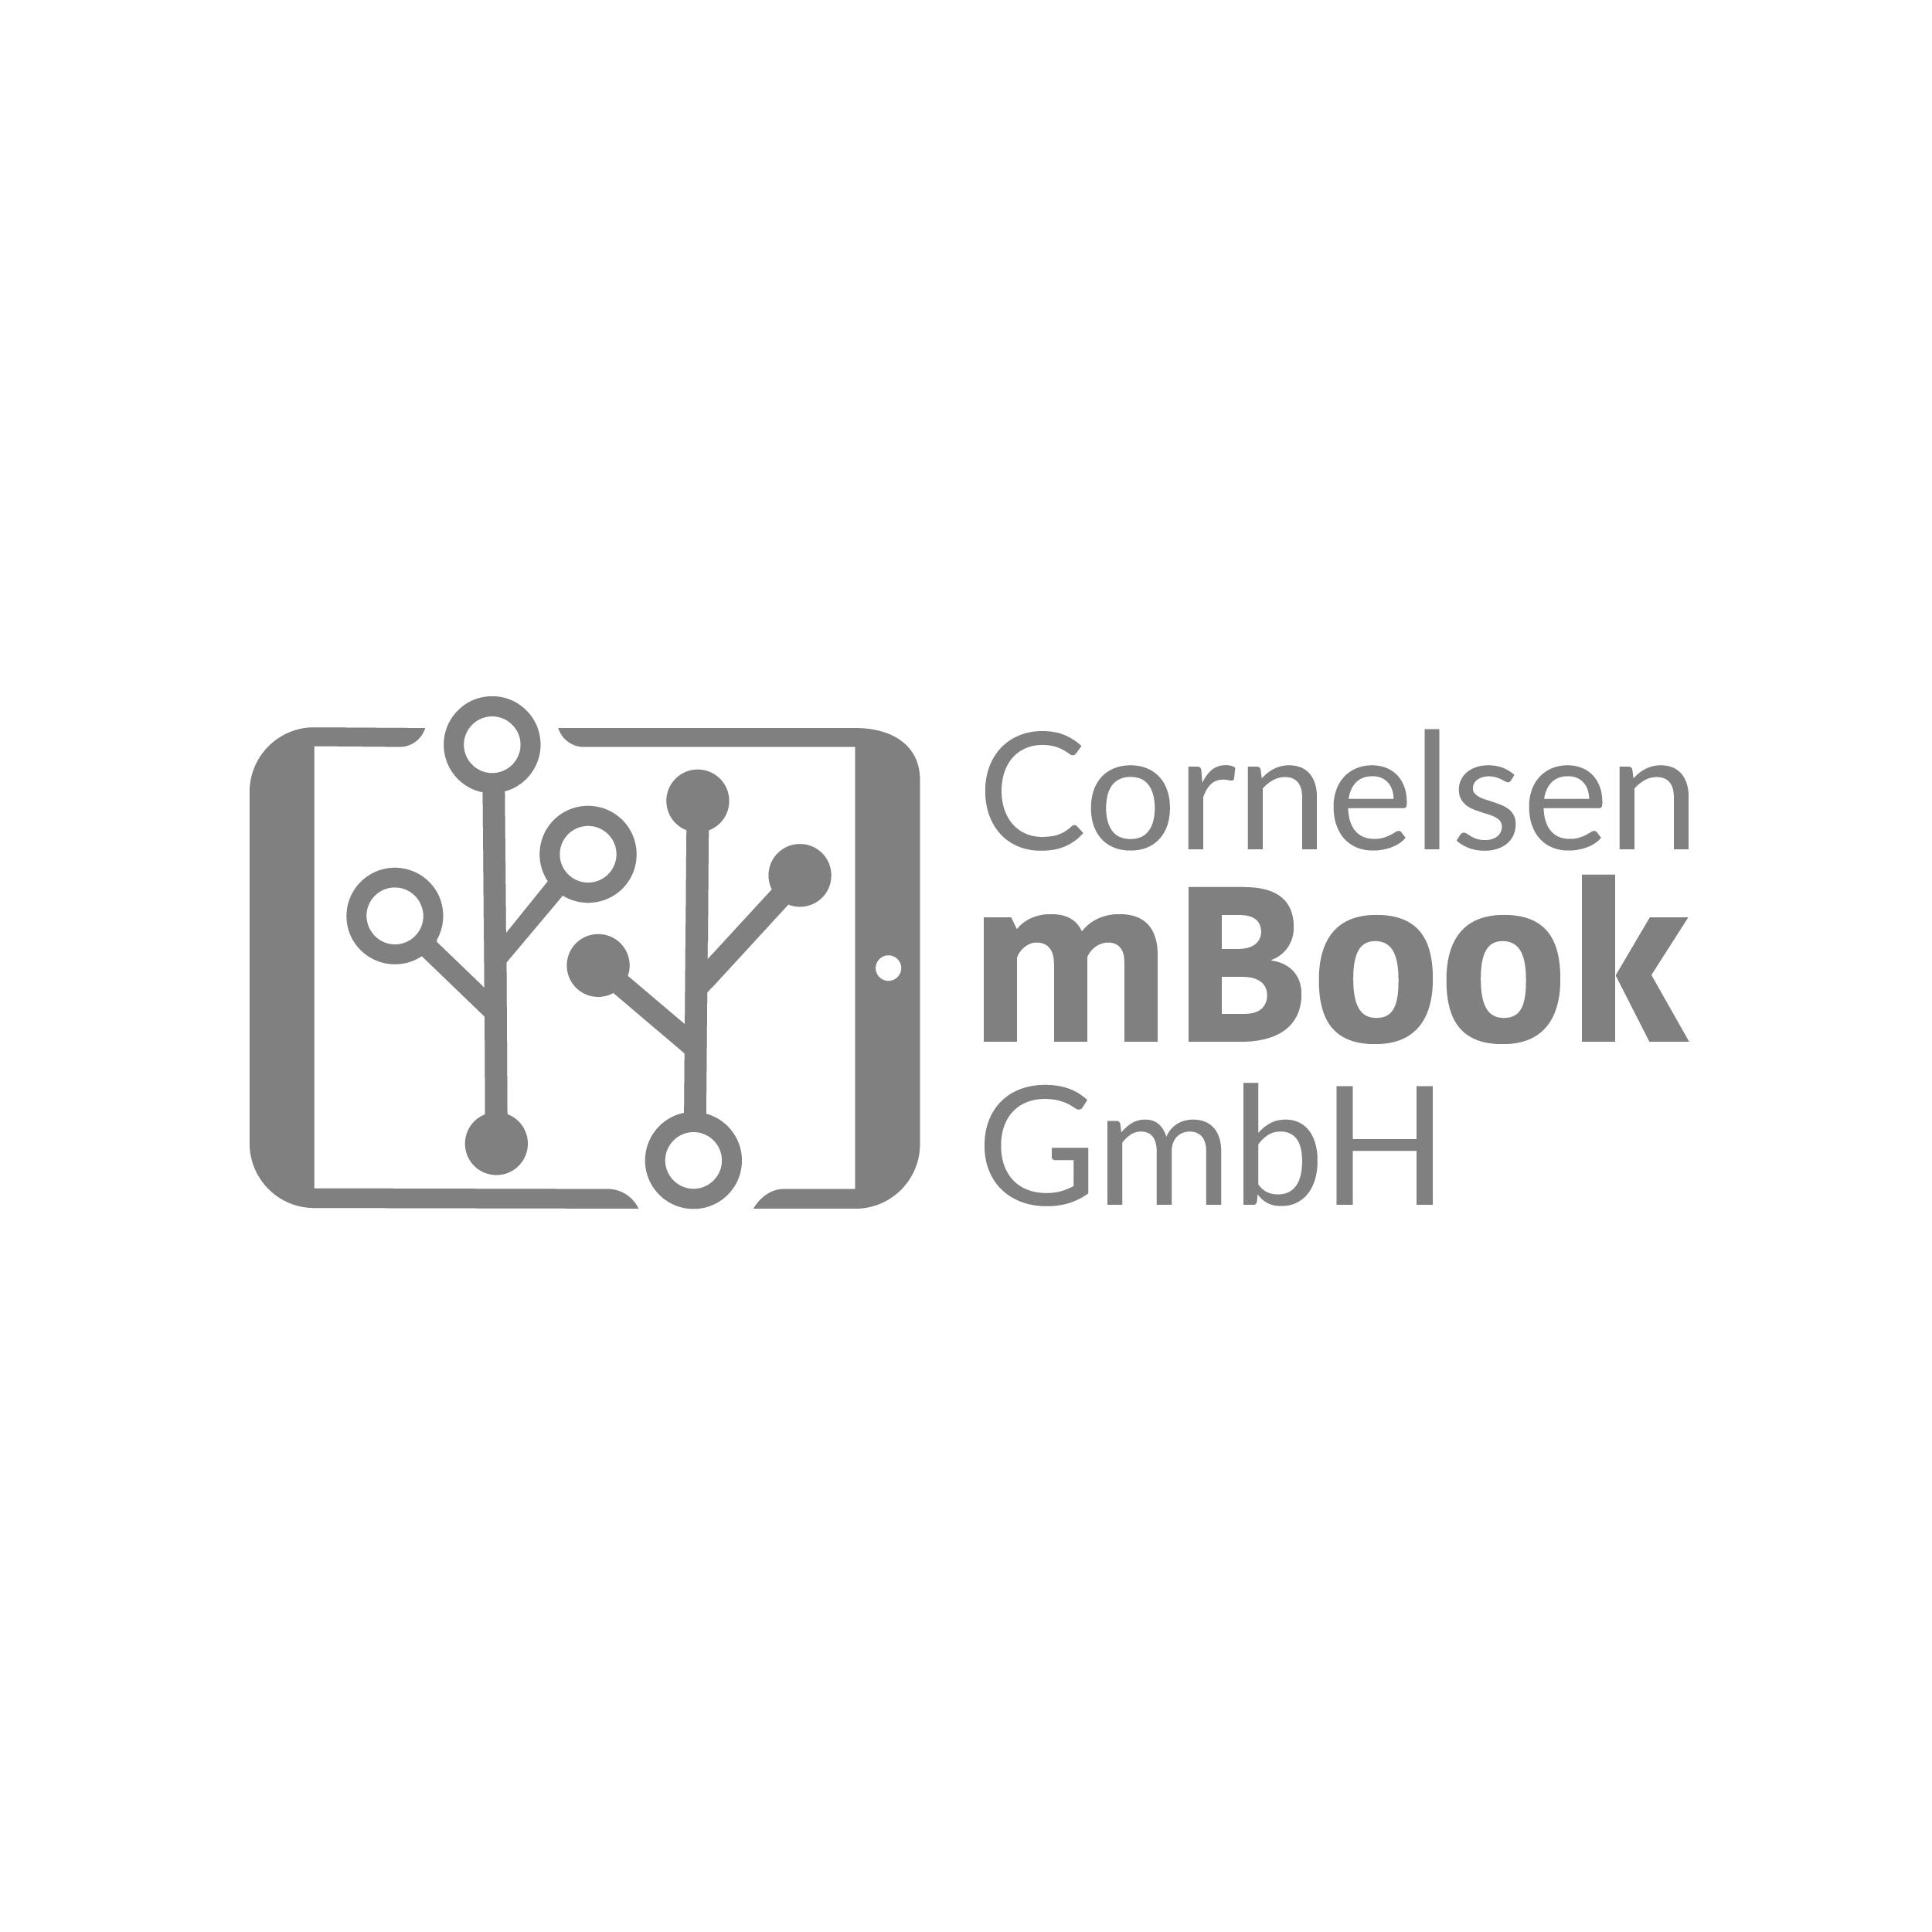 Cornelsen mBook GmbH